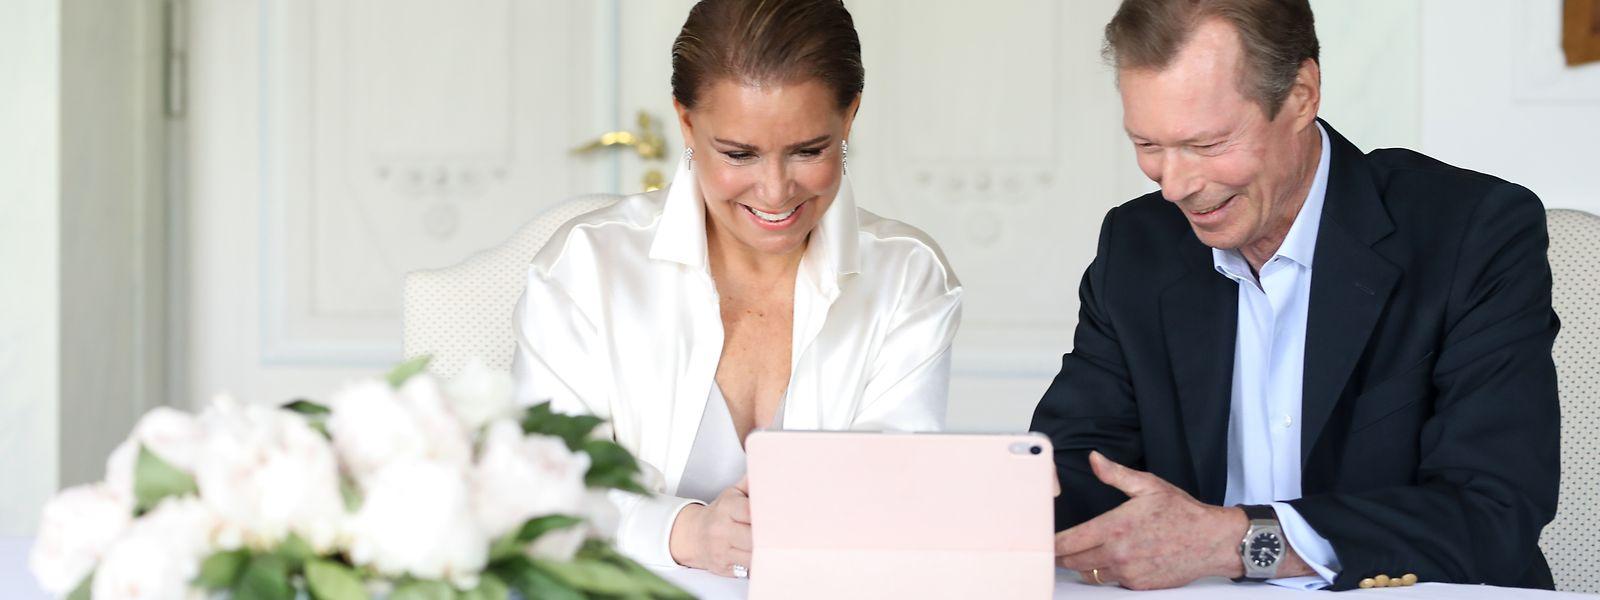 Per Skype-Call gratulierten Großherzog Henri und Großherzogin Maria Teresa den jungen Eltern.